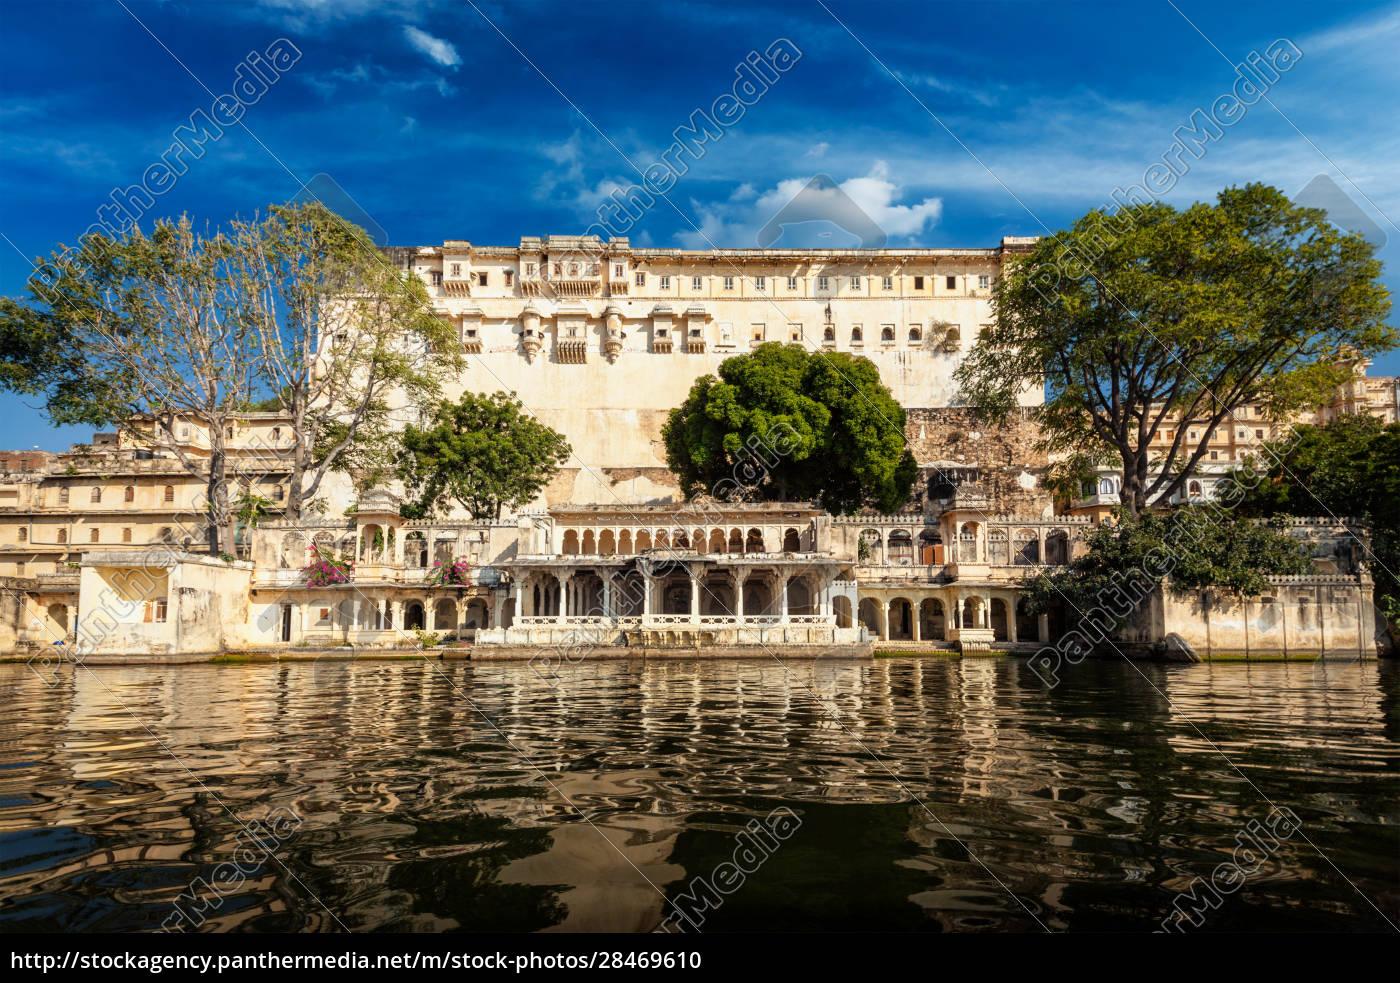 stadtpalast-komplex., udaipur, rajasthan, indien - 28469610